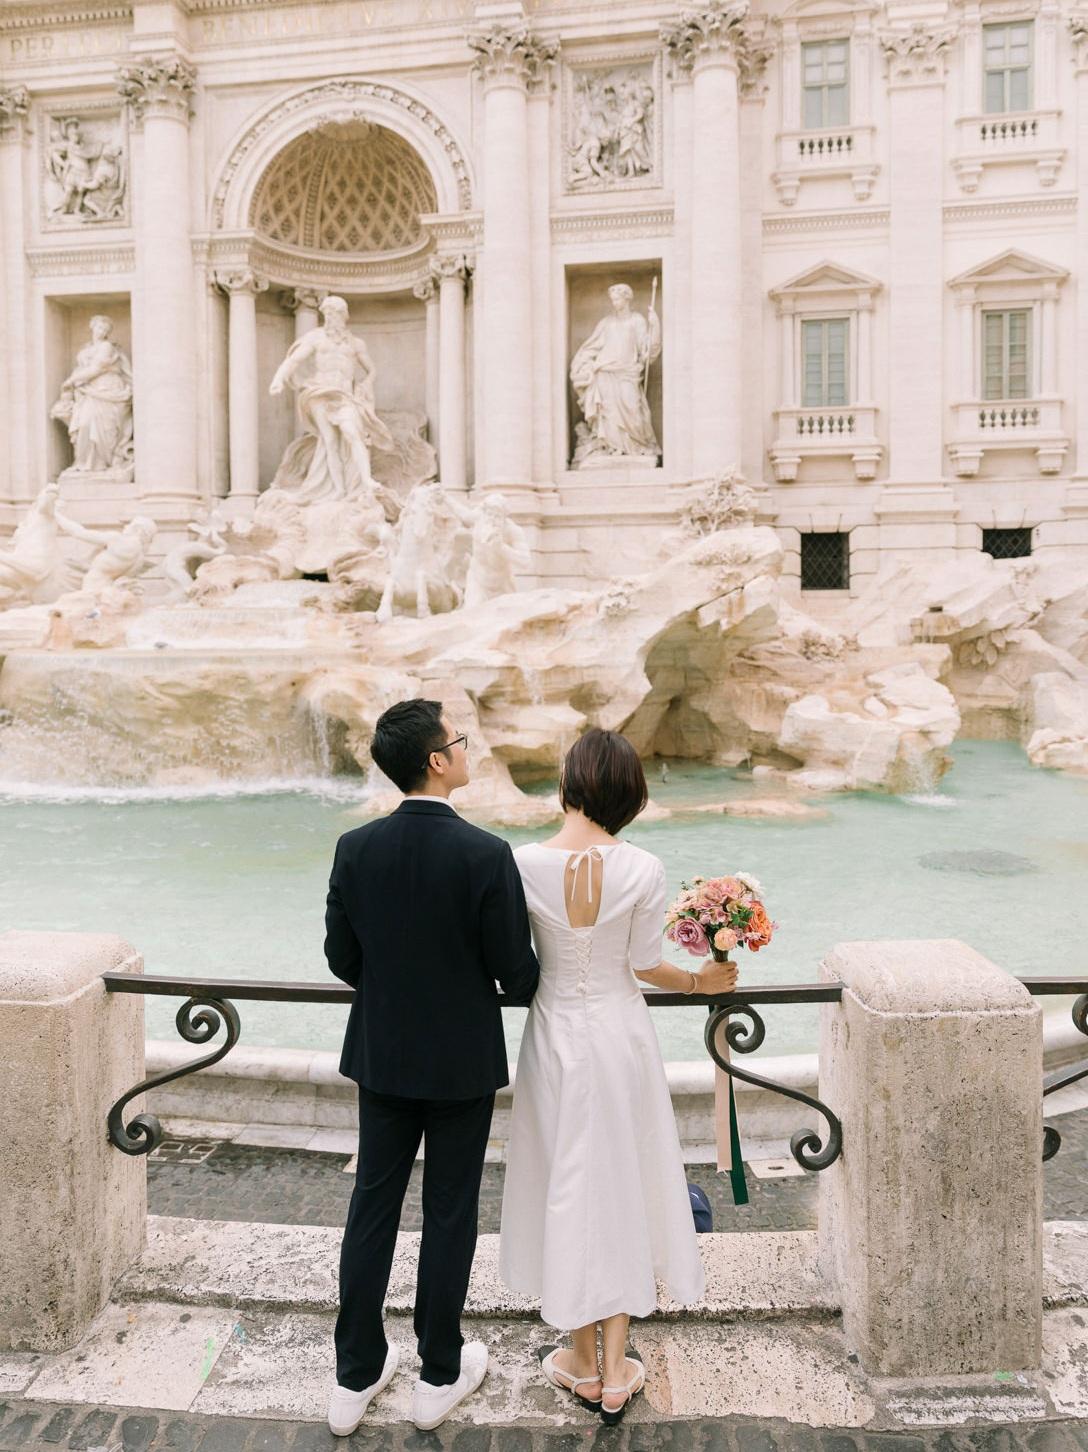 003_rome_engagement_prewedding_session_chymo_more_photography.jpg